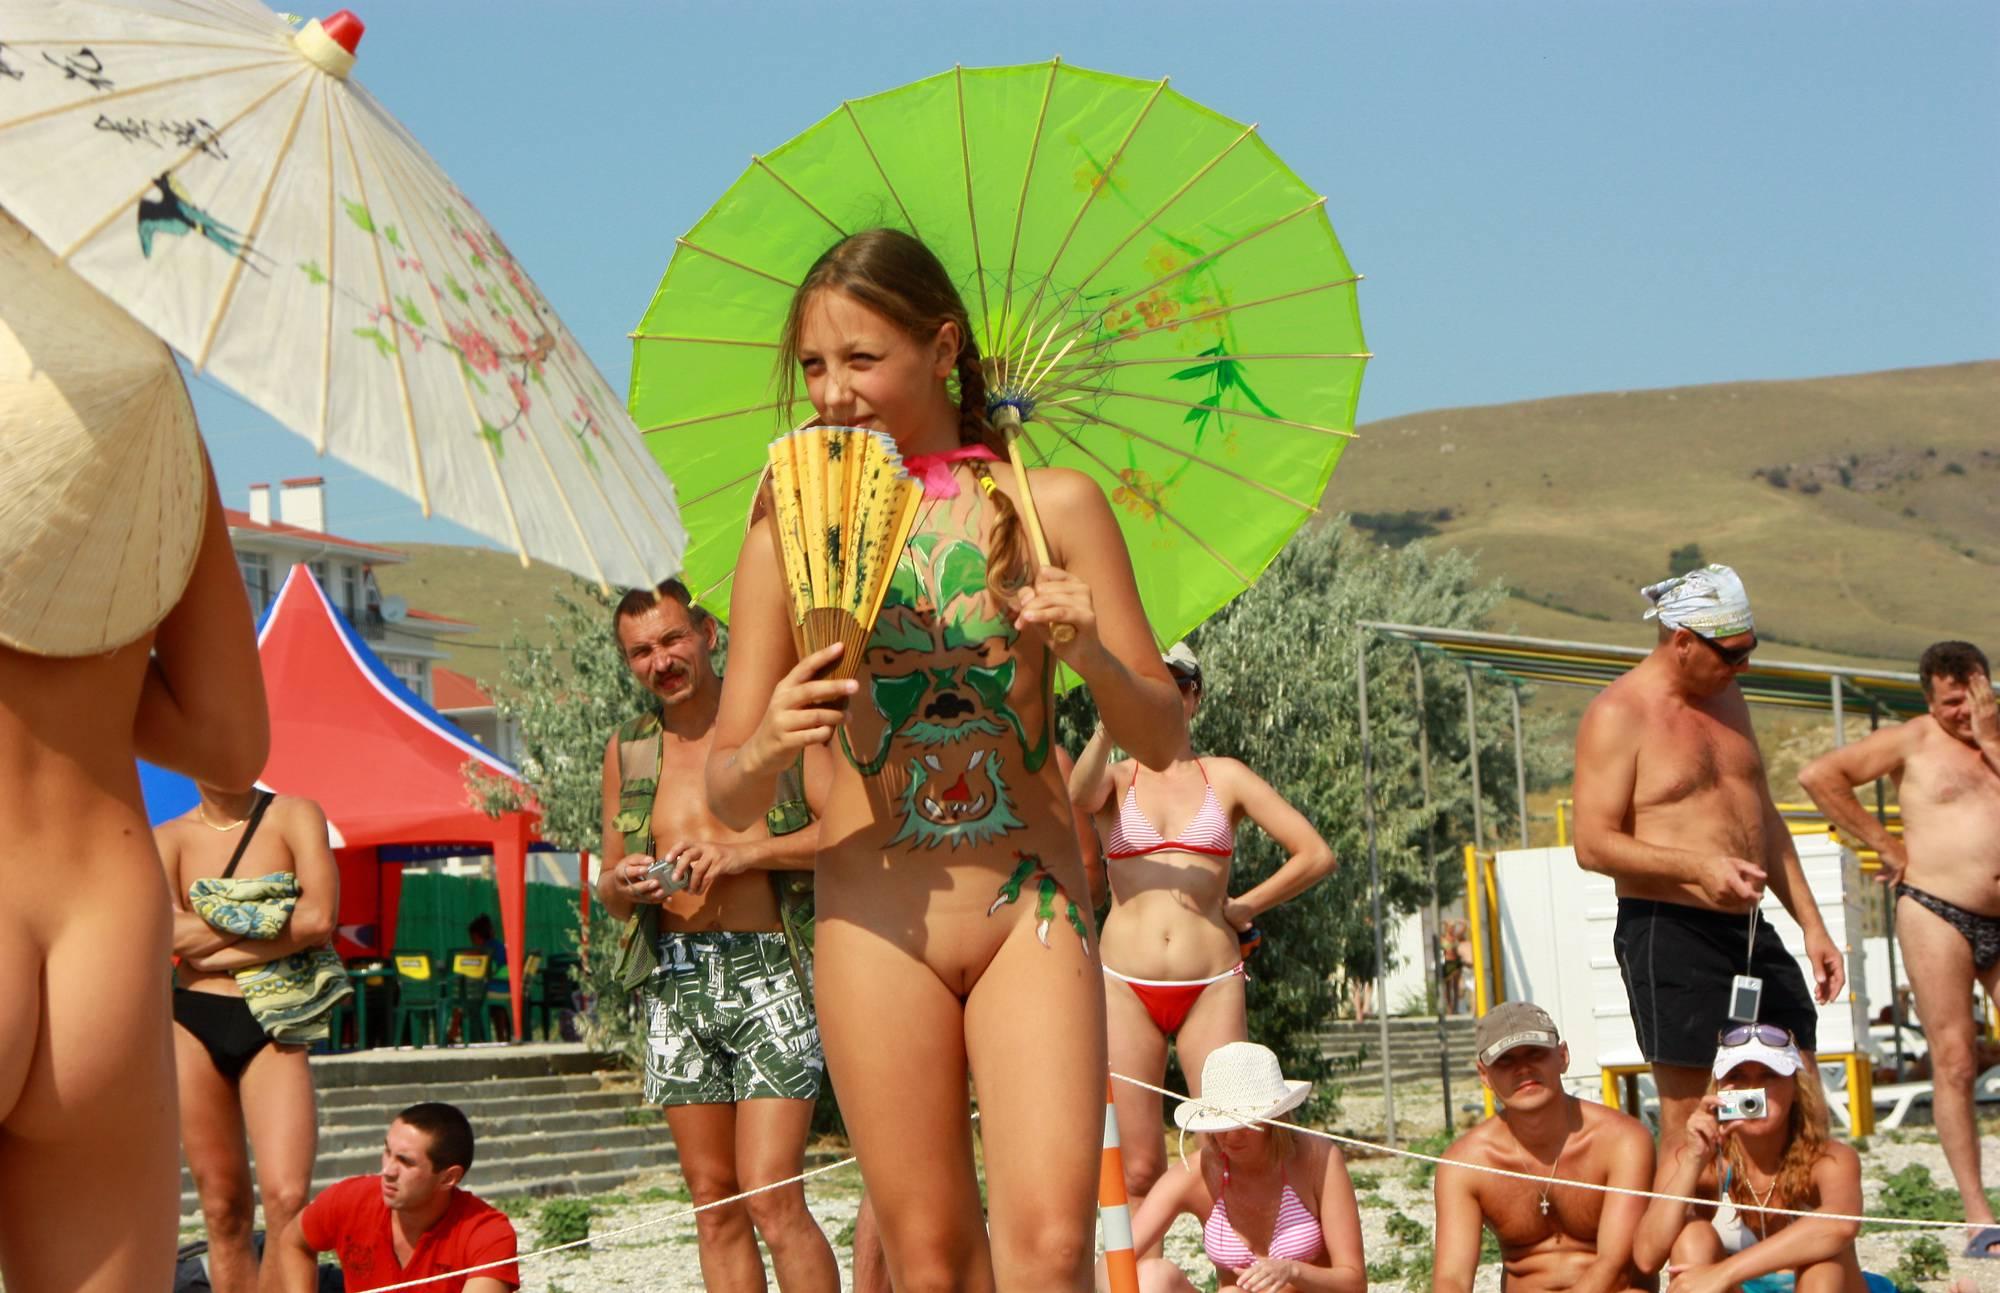 Nudist Gallery Miss Natura Hand Fan Play - 1